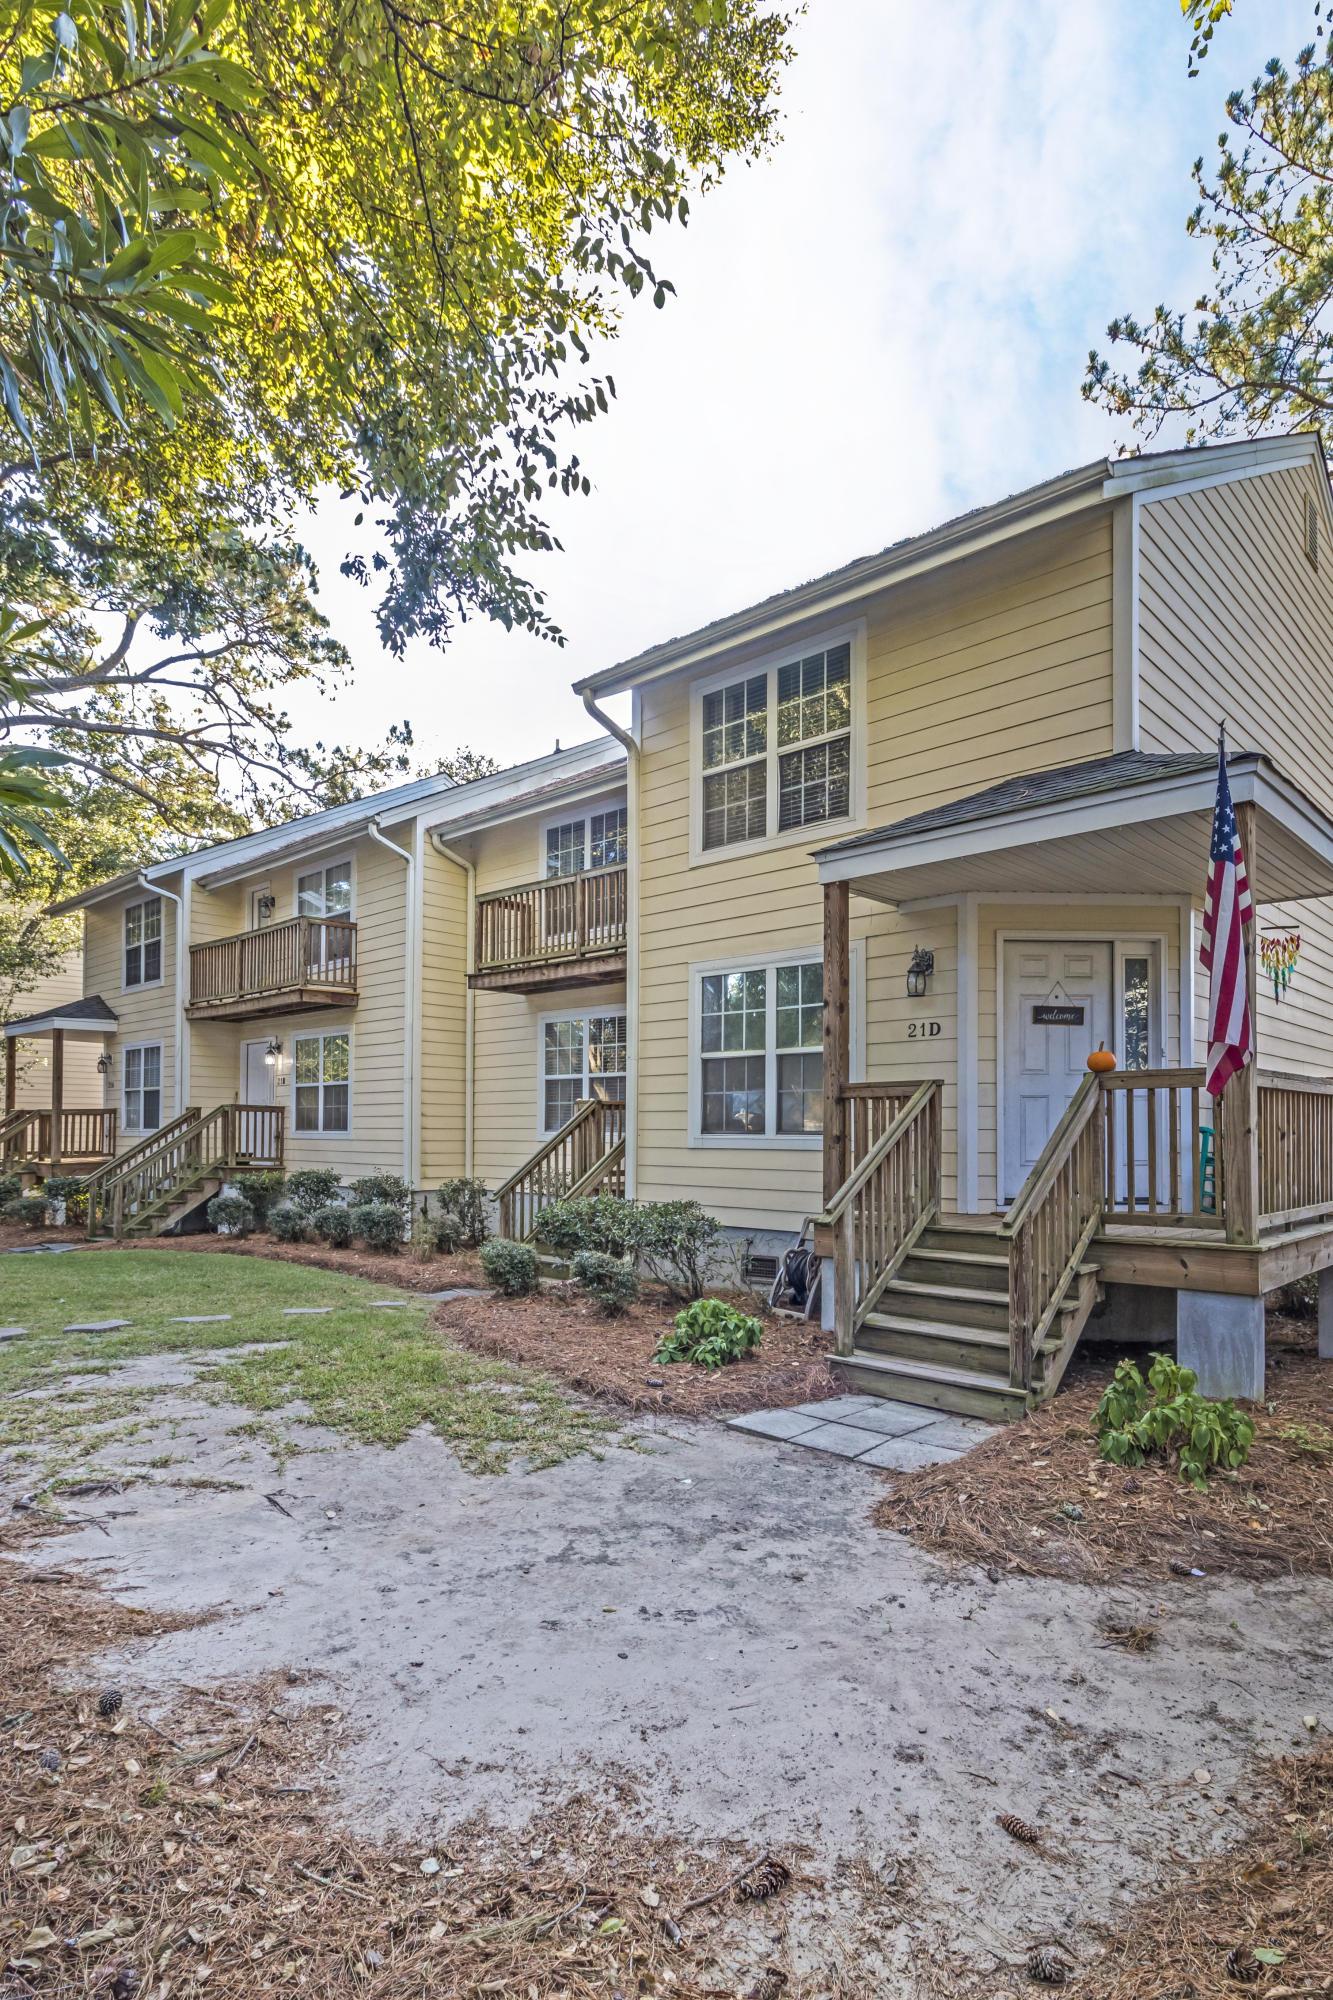 Pelican Cove Homes For Sale - 21 Brockman, Charleston, SC - 1